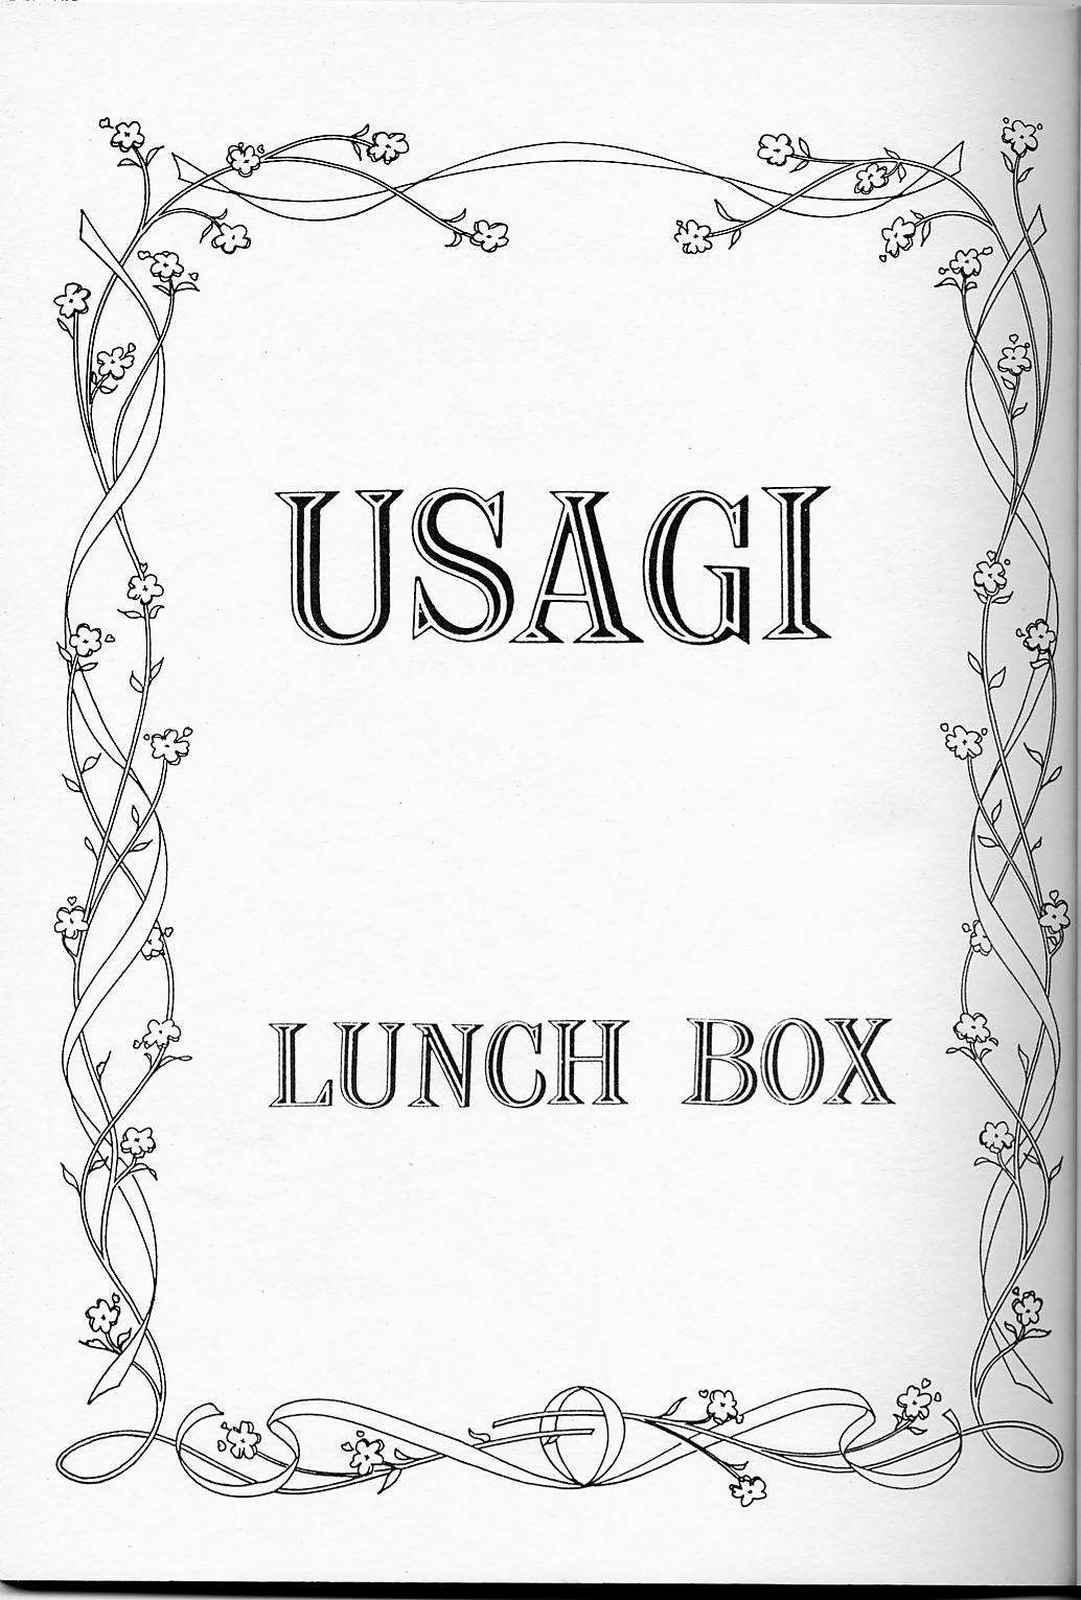 Lunch Box 6 - Usagi 1